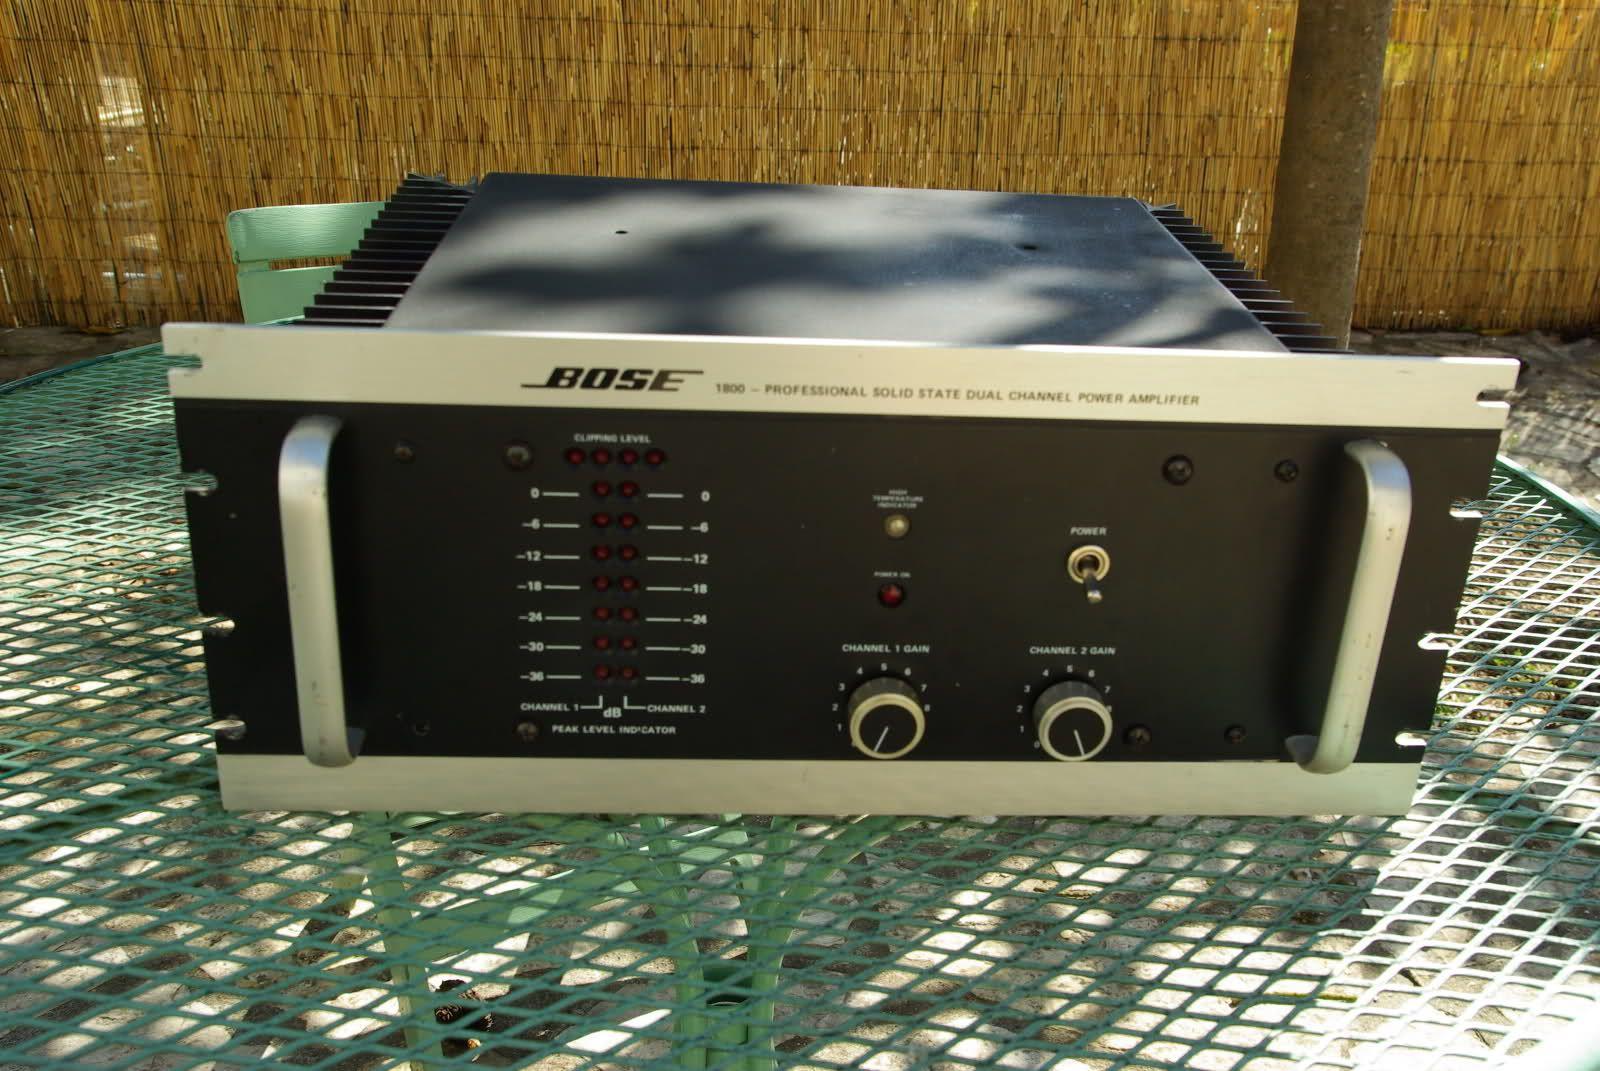 bose 1800 i power amplifier pinterest bose rh pinterest com